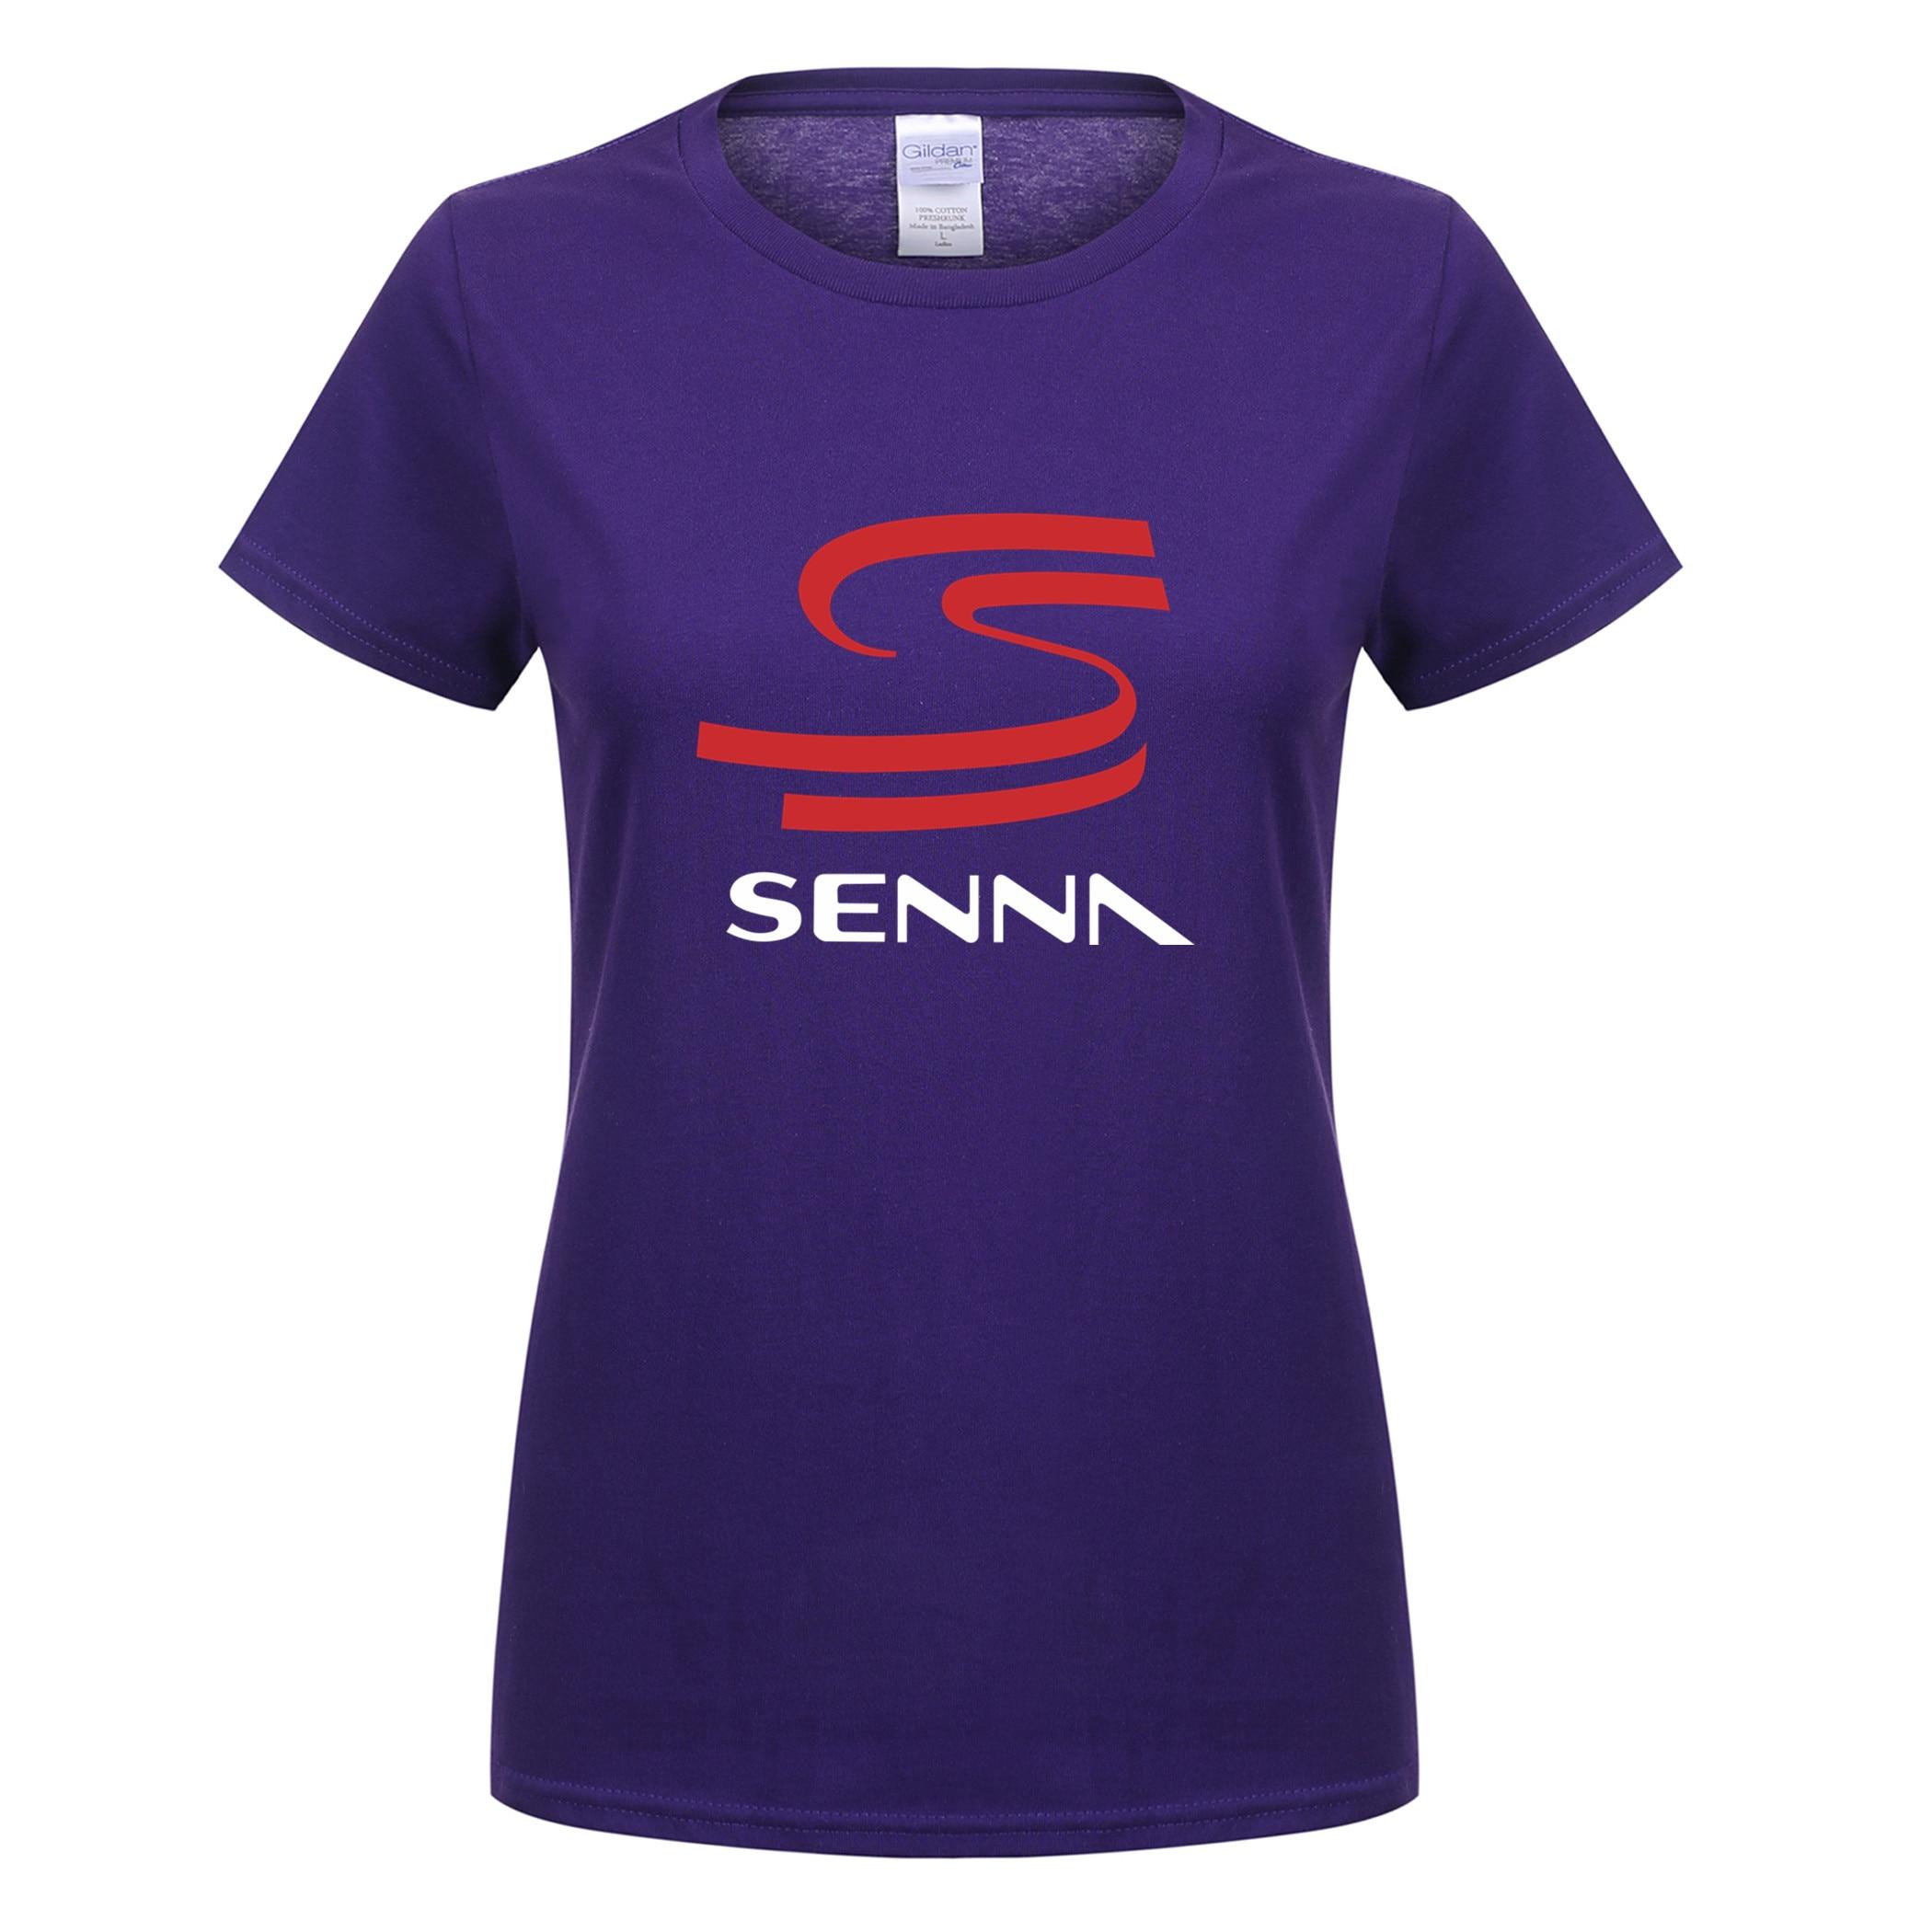 font-b-senna-b-font-summer-woman's-t-shirt-f1-racing-driver-track-printed-casual-cool-loose-t-shirt-crewneck-100-cotton-top-tees-ot-199